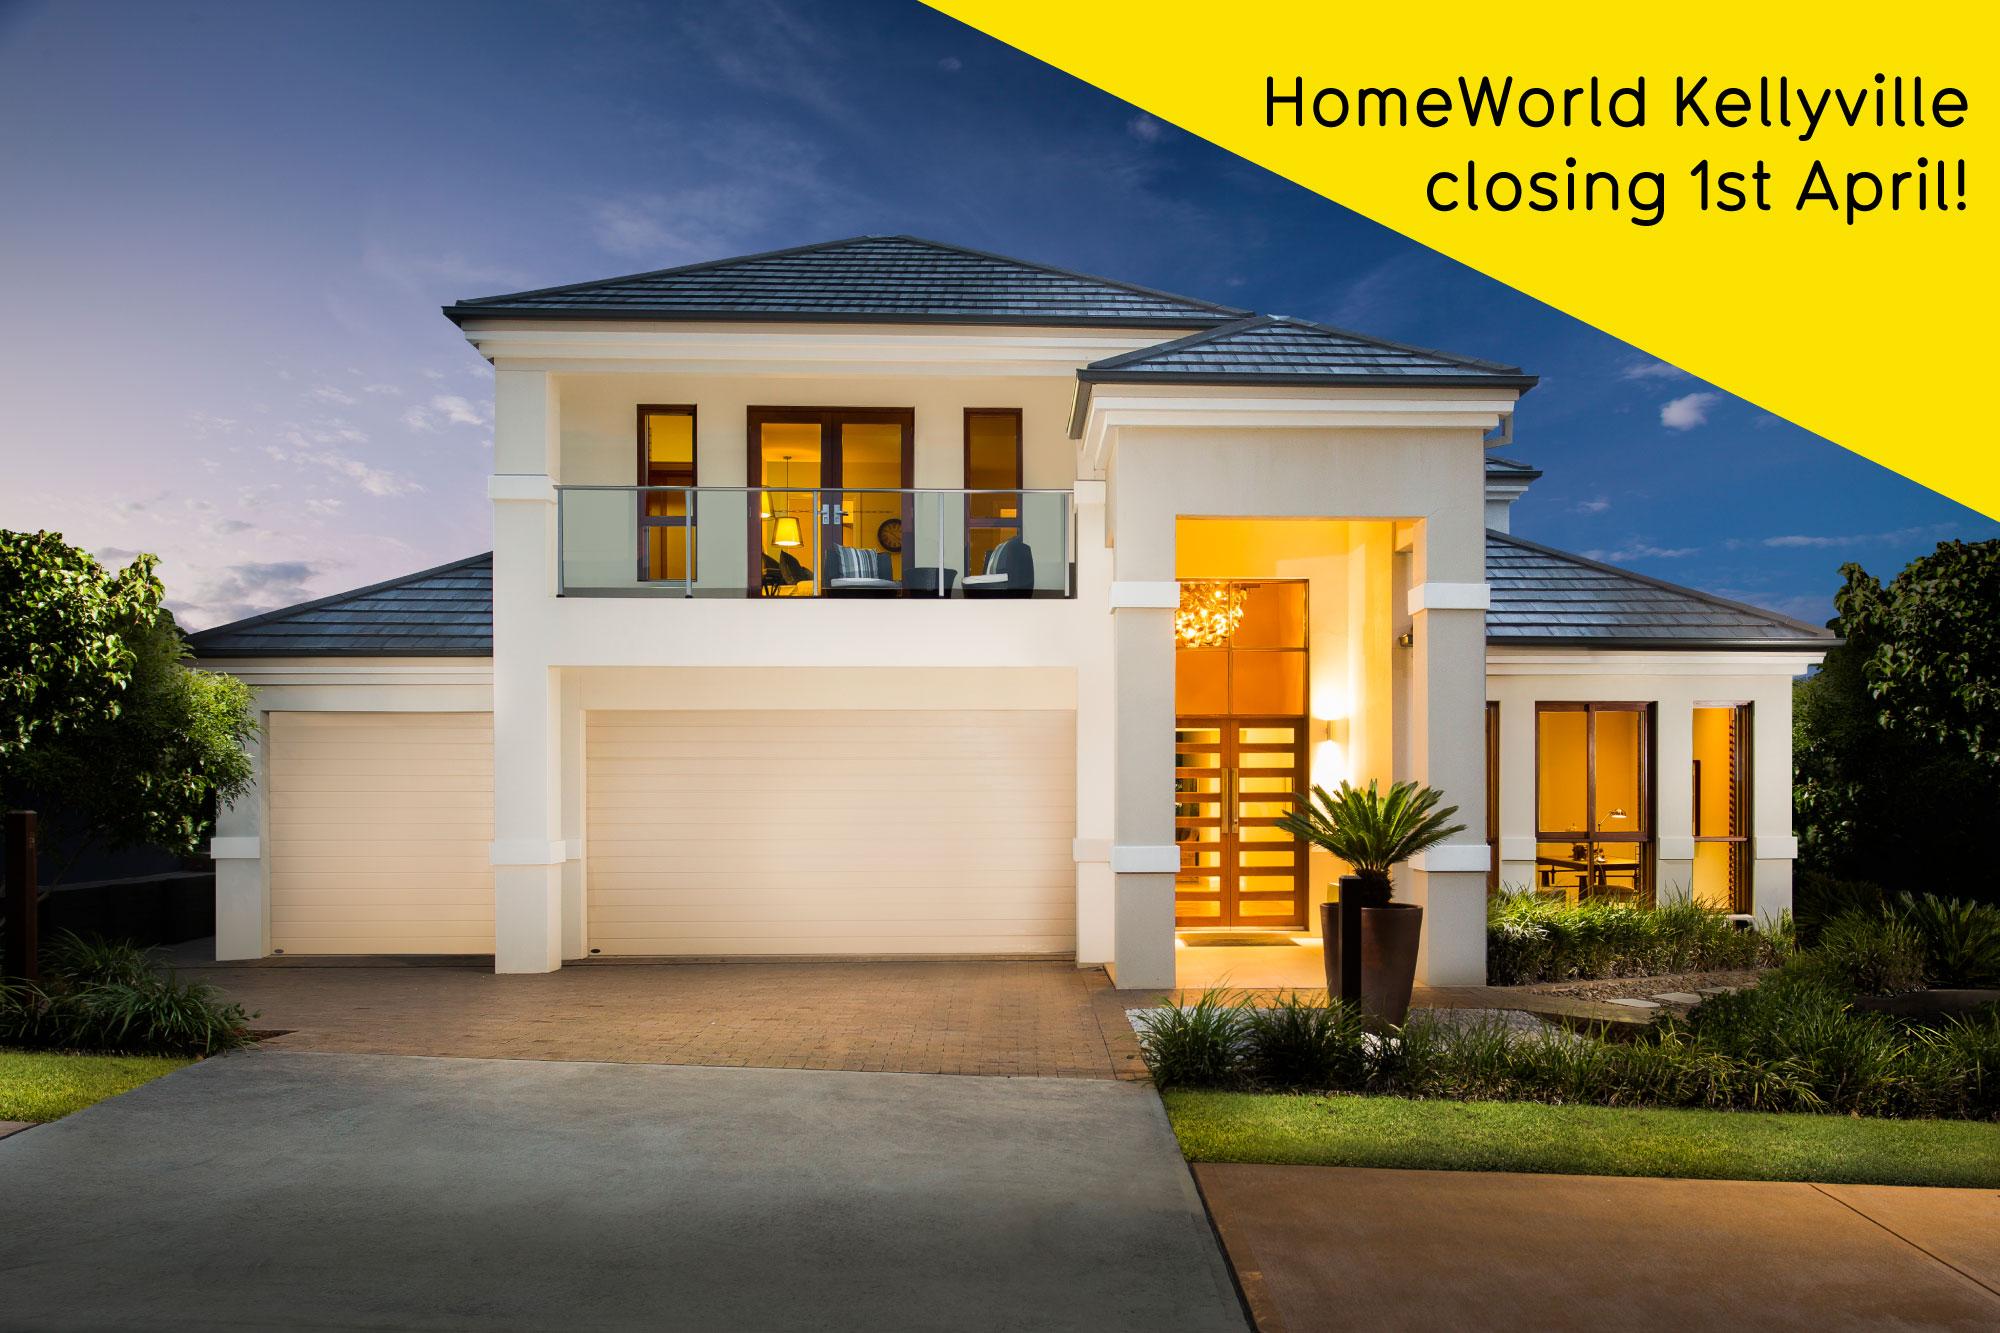 hallharthomes-elyse-homeworld-closing-004